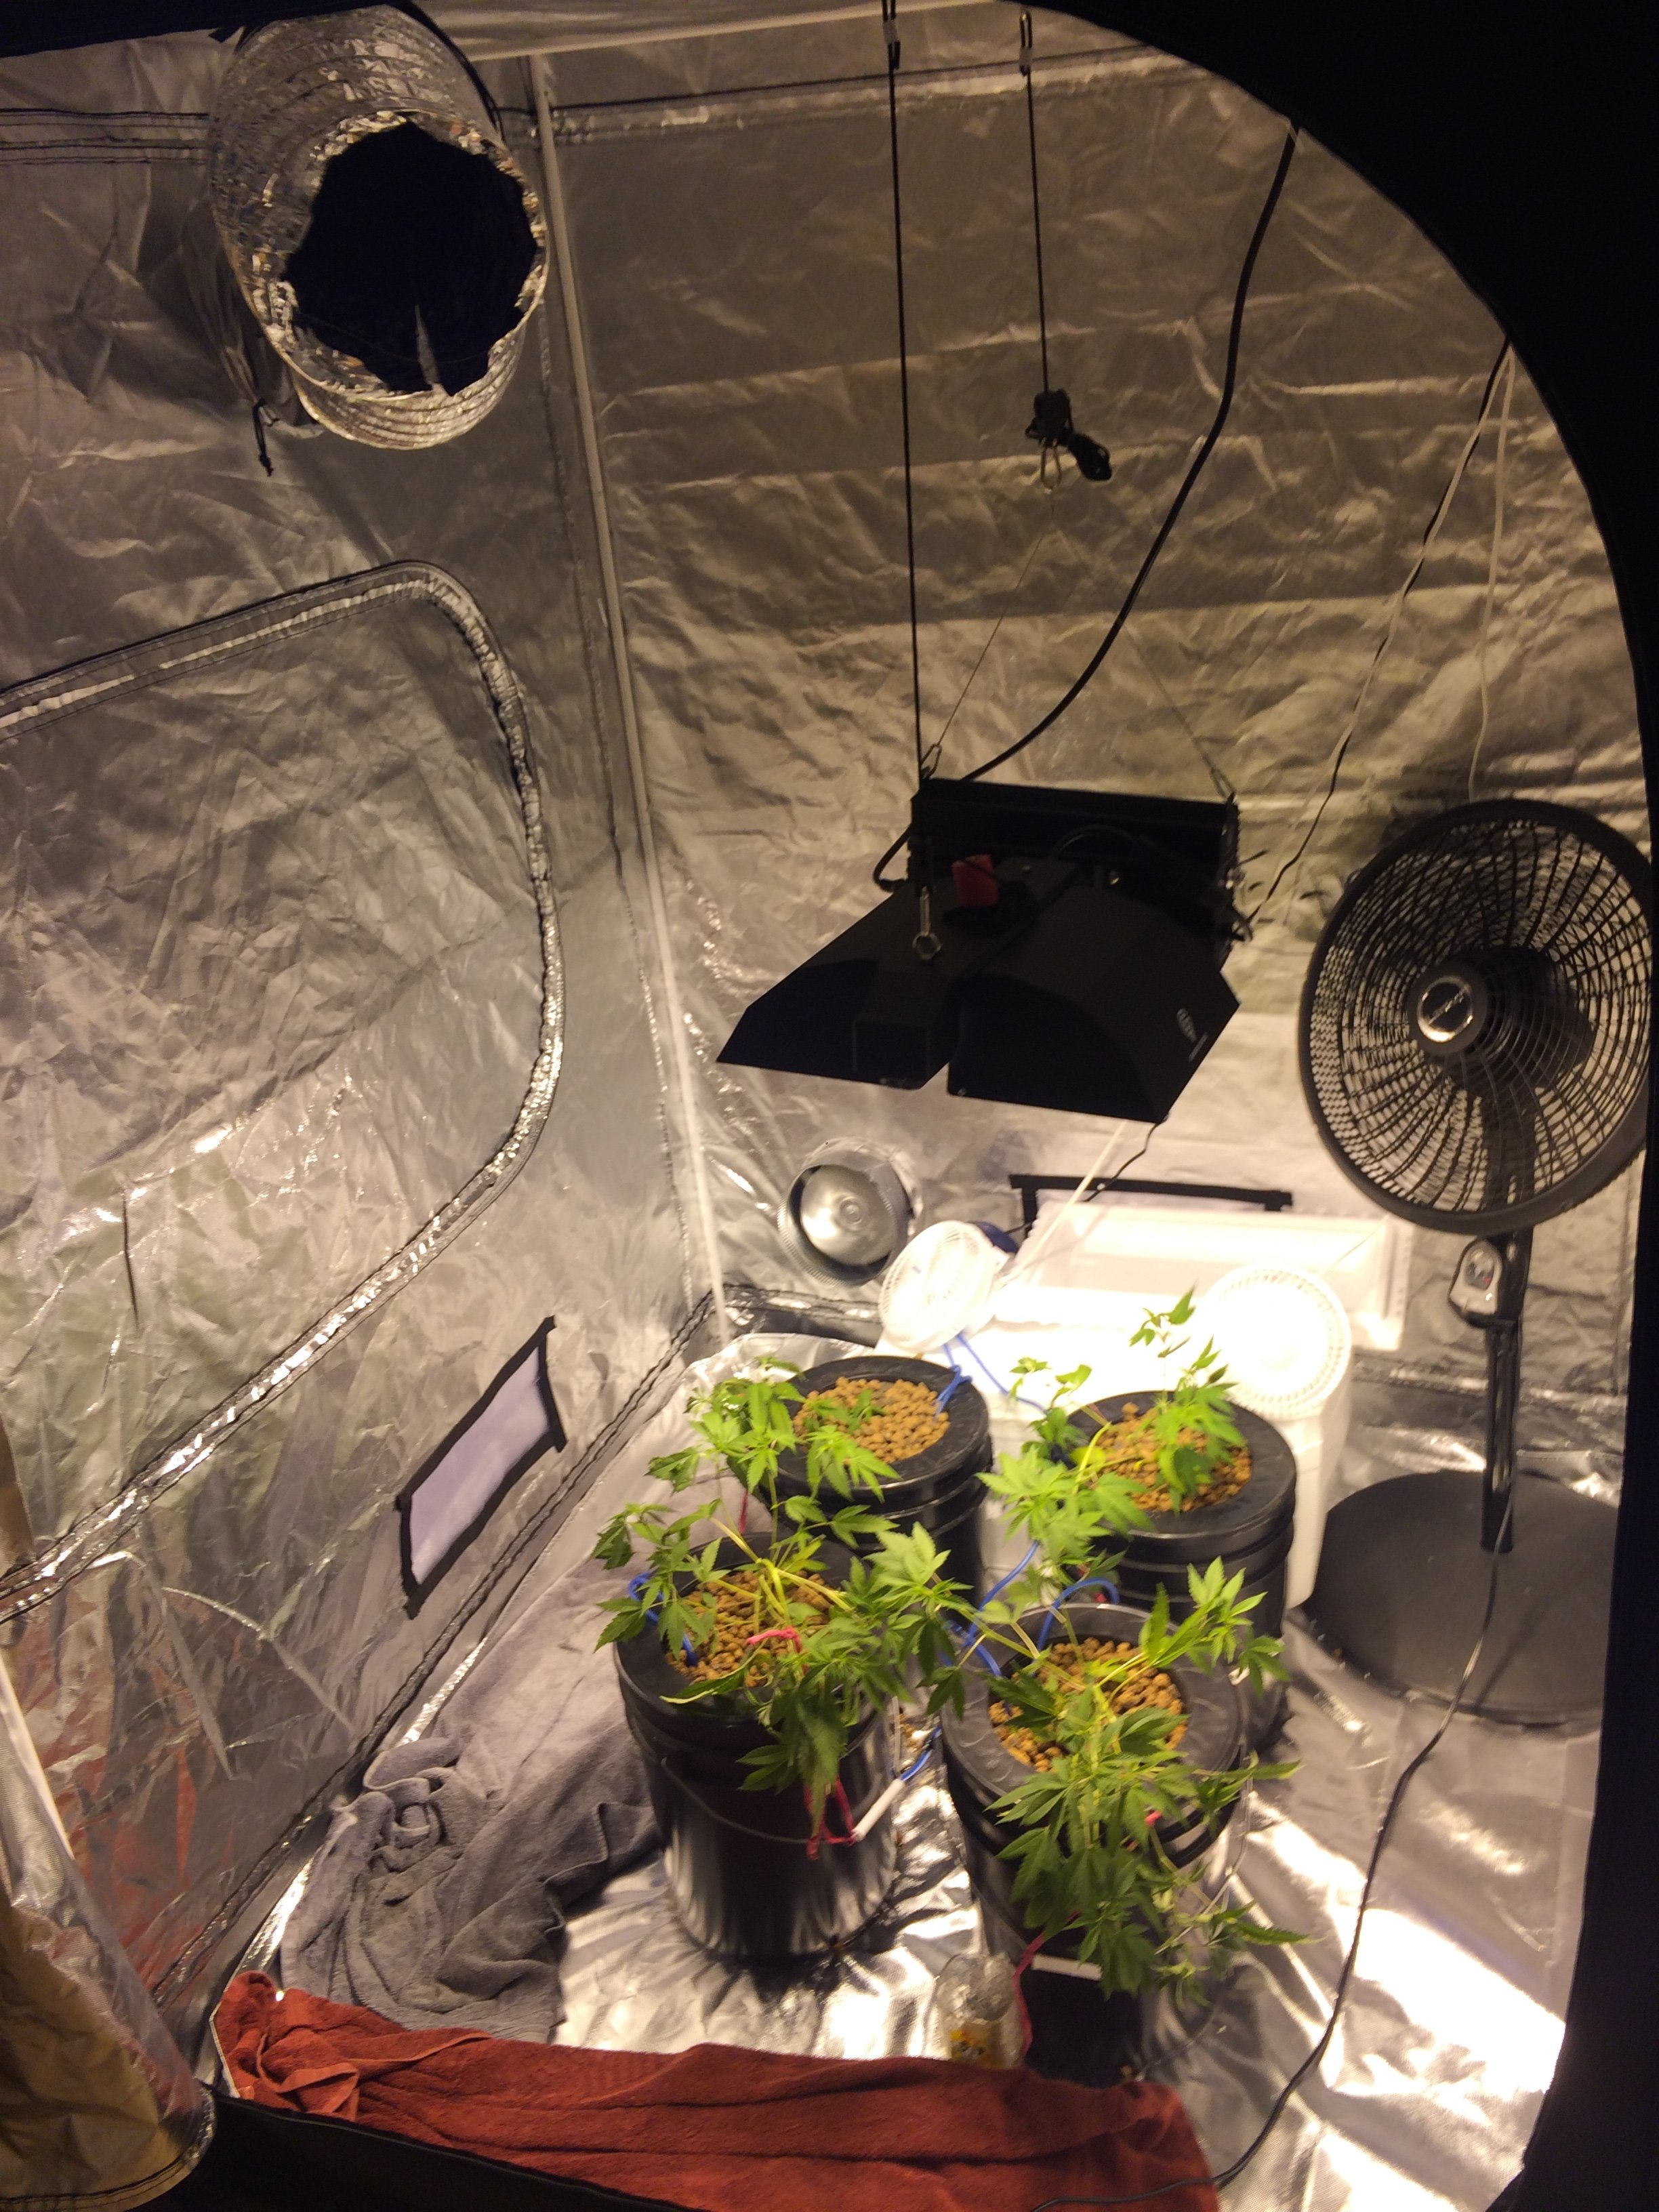 5x5 Grow 4 OG clones  DE MH/HPS 1000w | Grasscity Forums